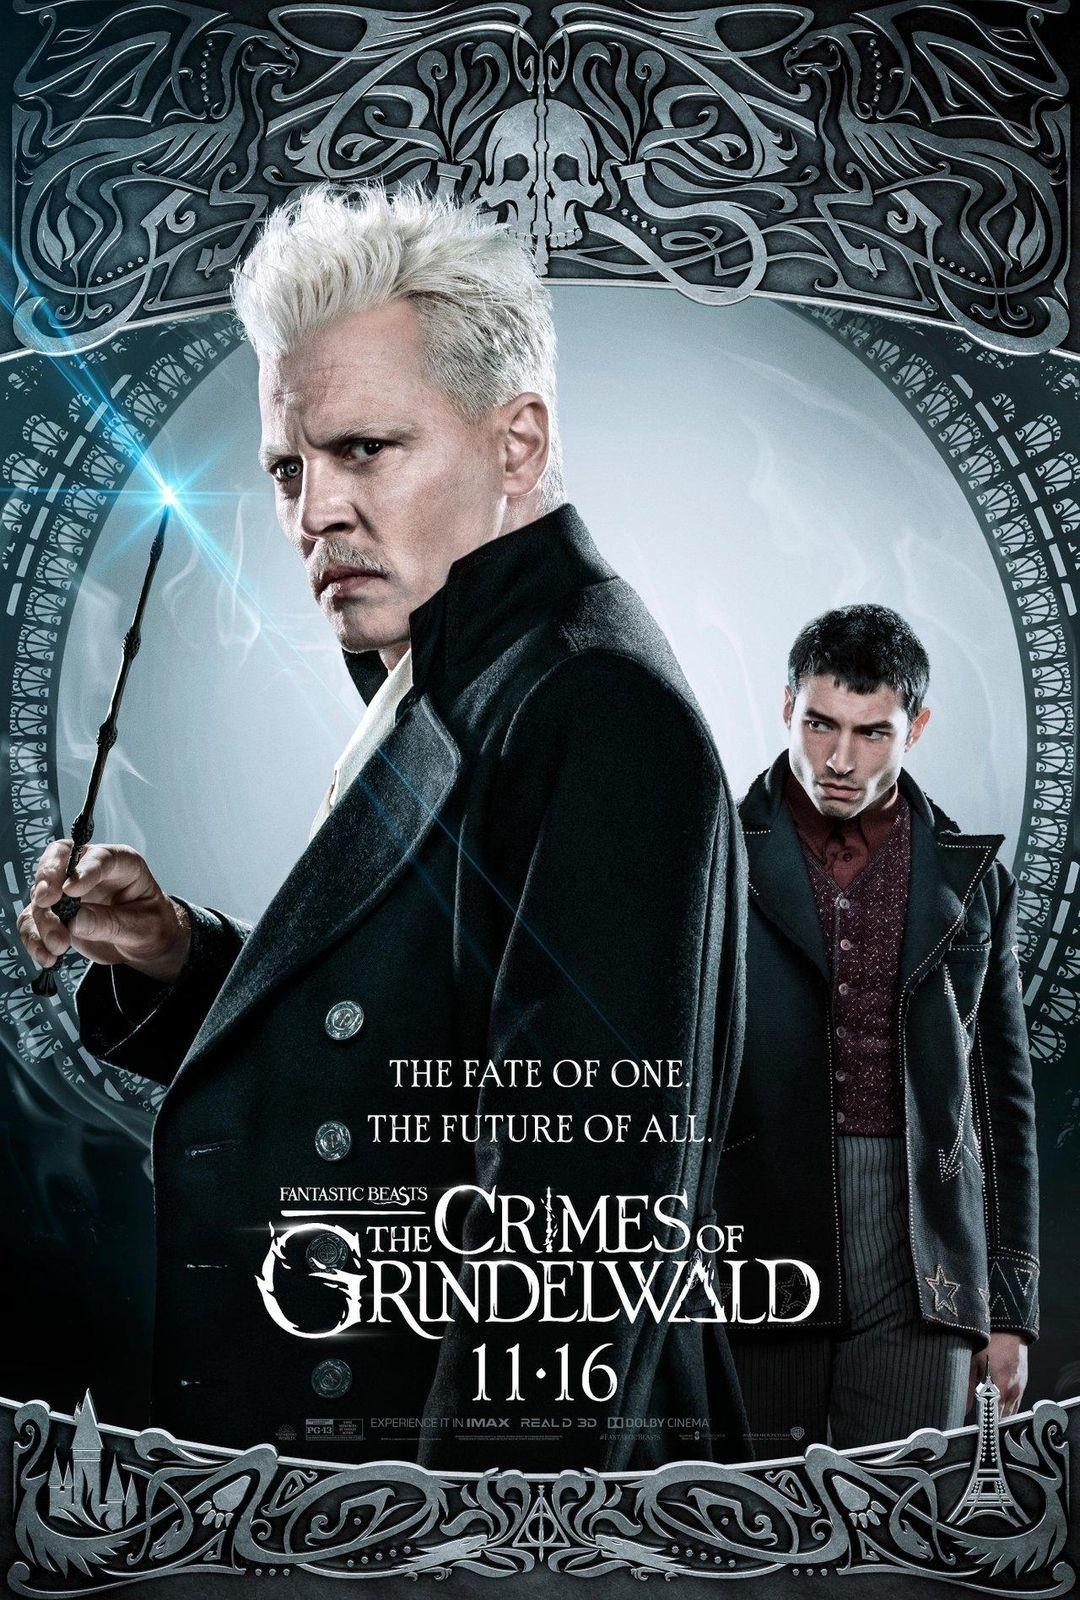 Animali fantastici: i crimini di Grindelward al Cinema San Martino